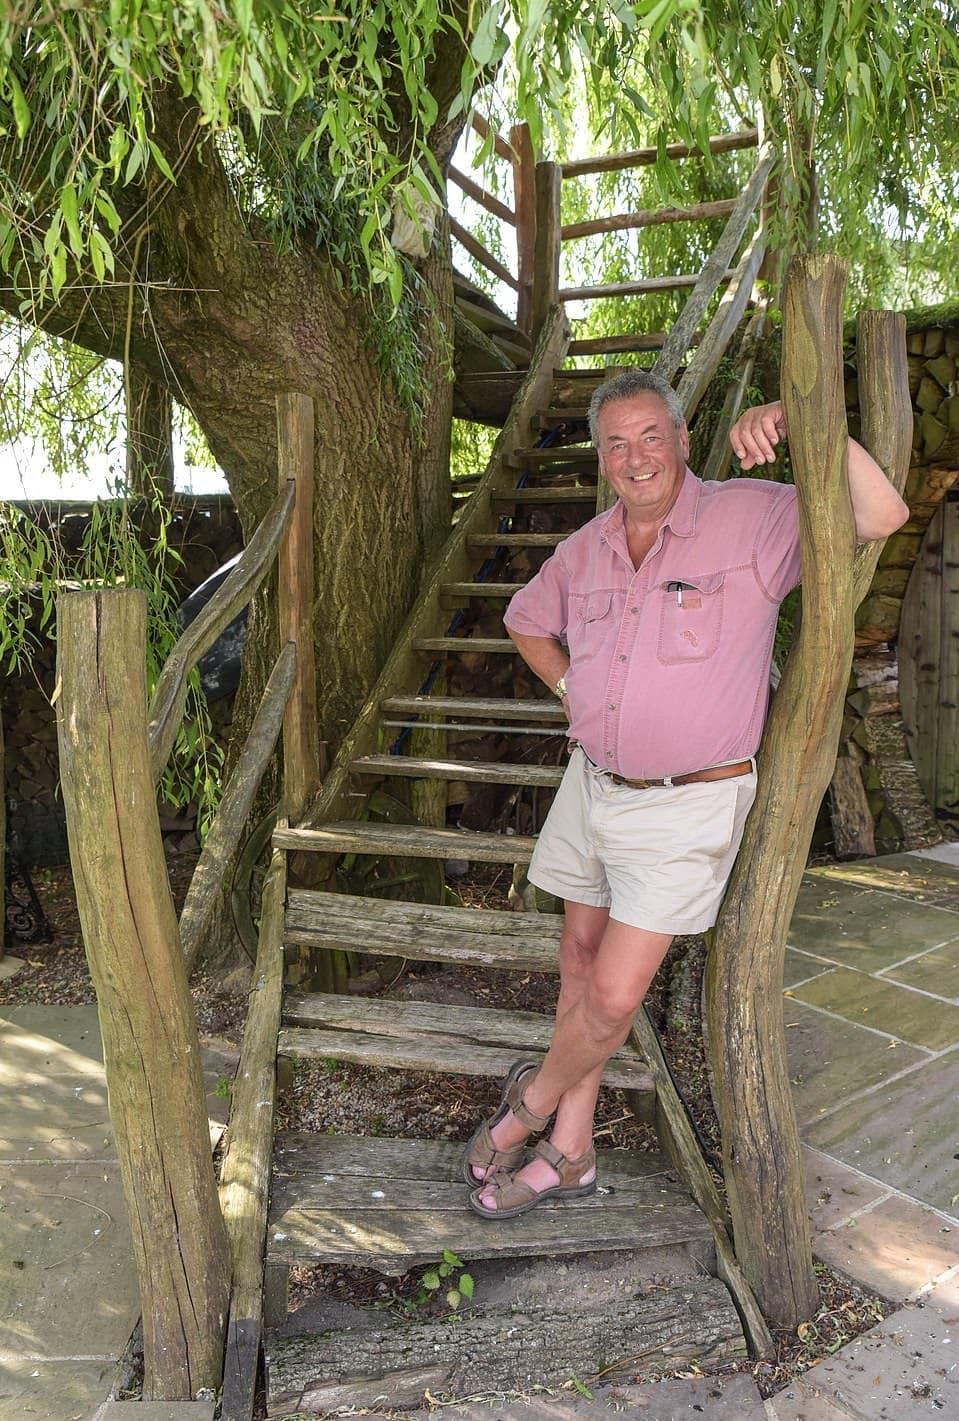 15764924 7223977 terry meredith on the steps to his tree house handmade from logs a 26 1562578227636 - Британец хотел спилить дерево, но вид оттуда оказался так хорош, что он построил на нём домик